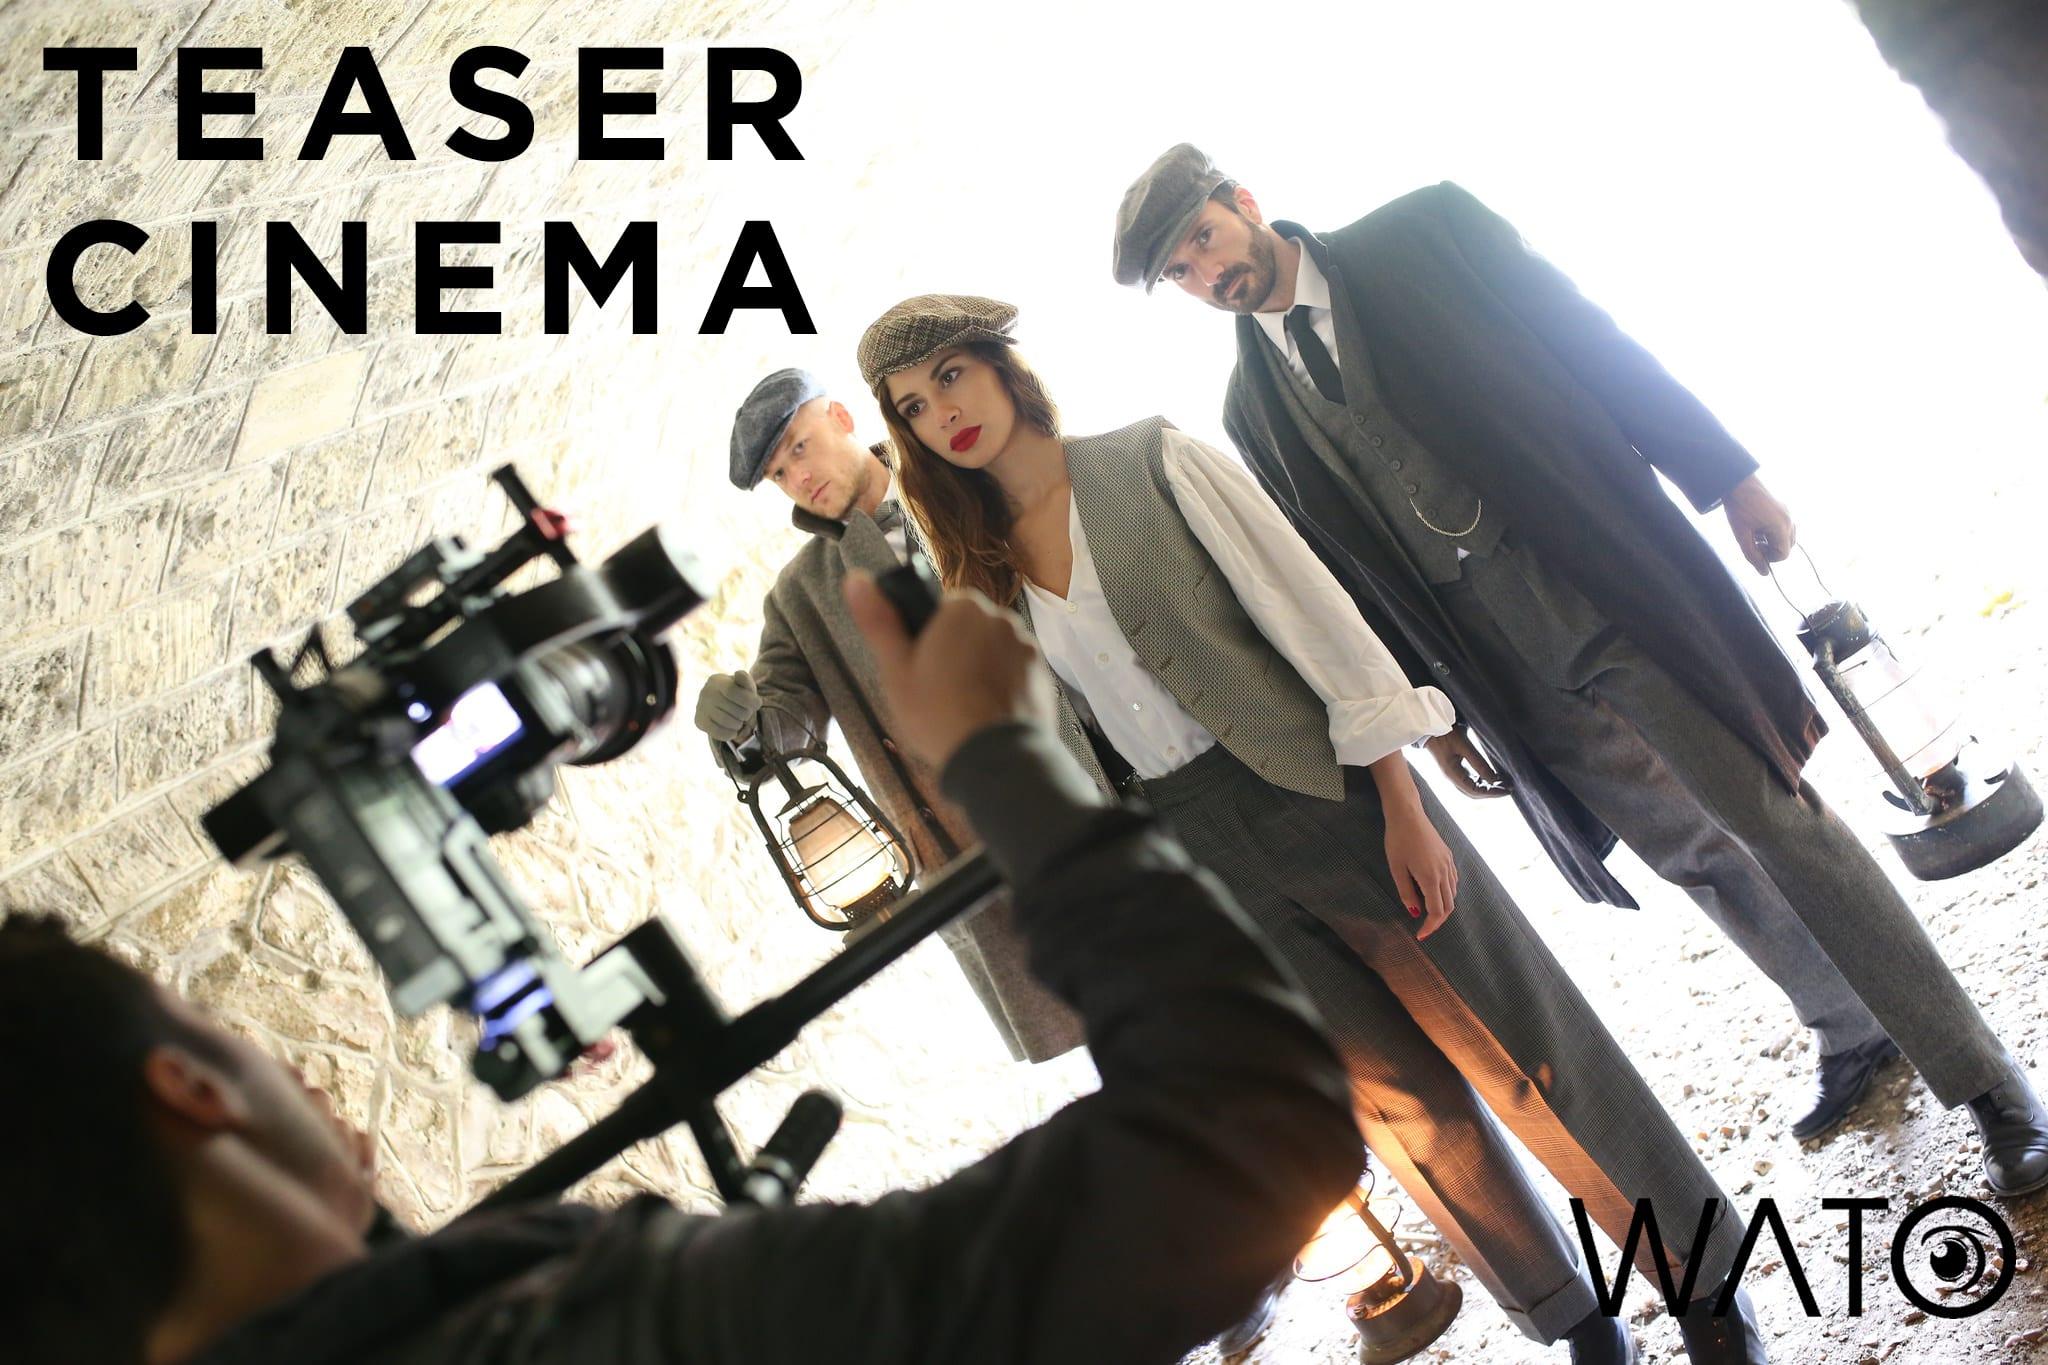 Teaser-wato-cinéma